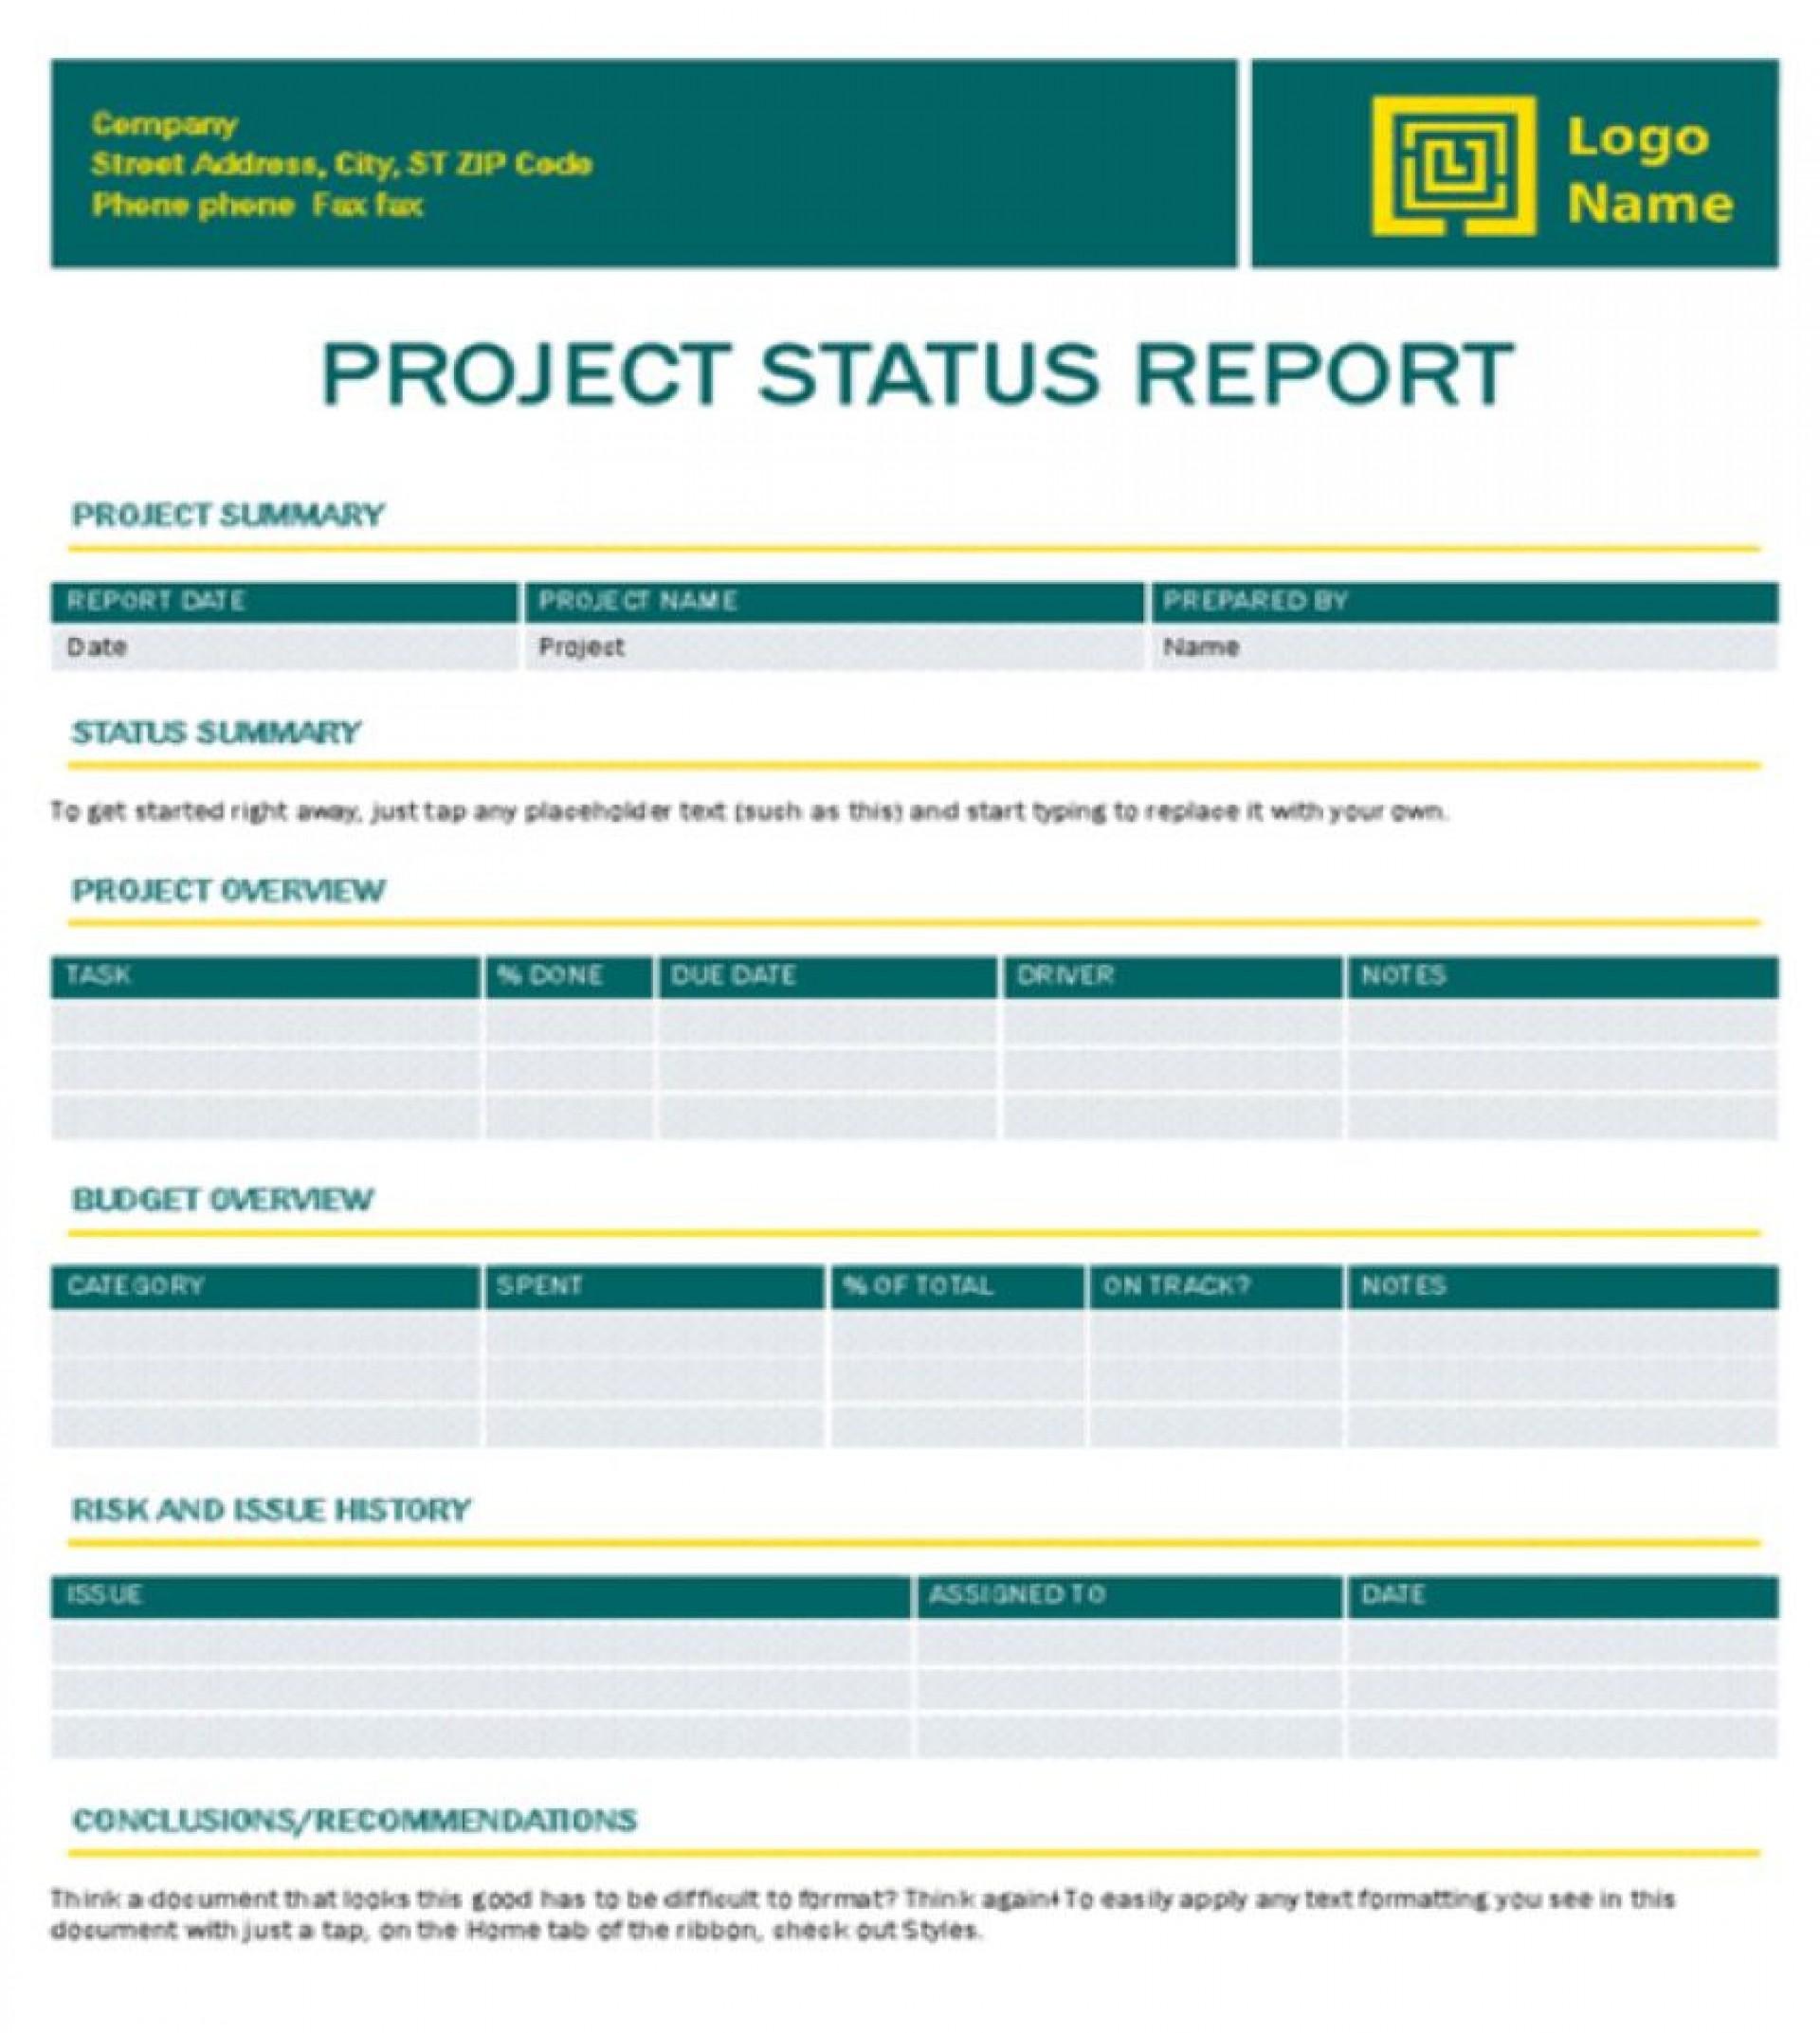 007 Impressive Project Management Statu Report Template Powerpoint Picture  Template+powerpoint Ppt1920